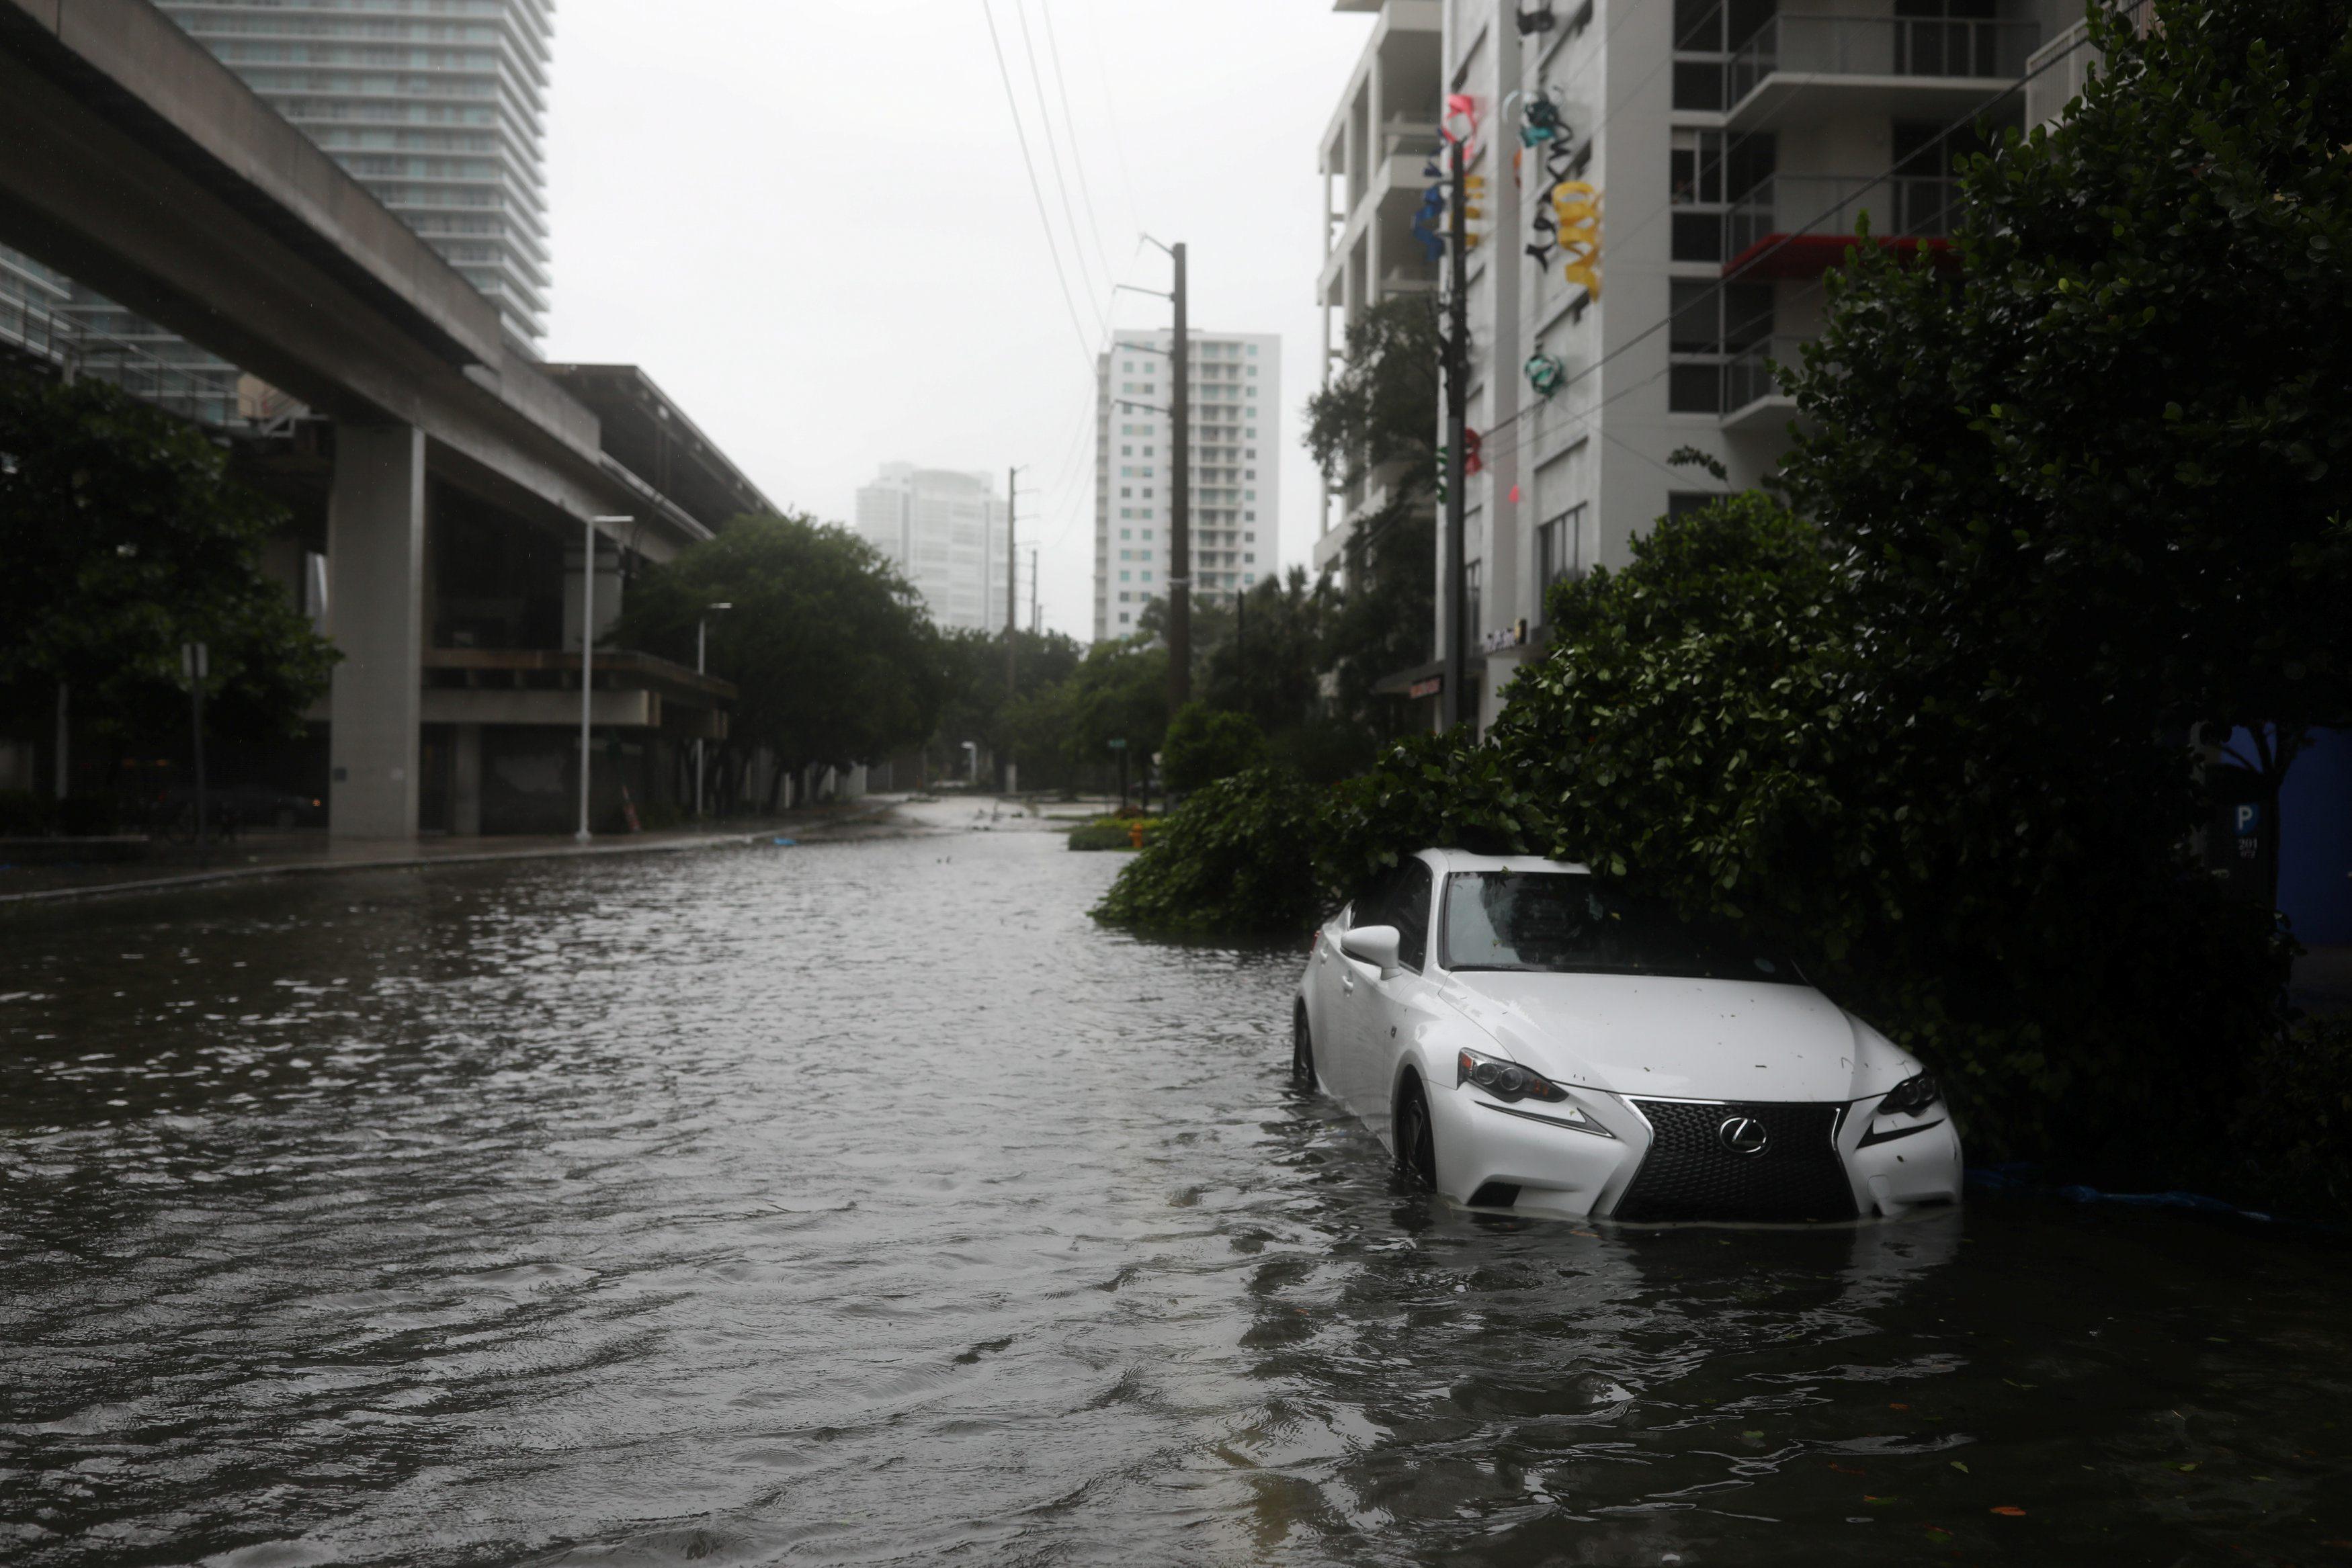 Flooding in the Brickell neighborhood as Hurricane Irma passes Miami, Florida, U.S. September 10, 2017. REUTERS/Stephen Yang